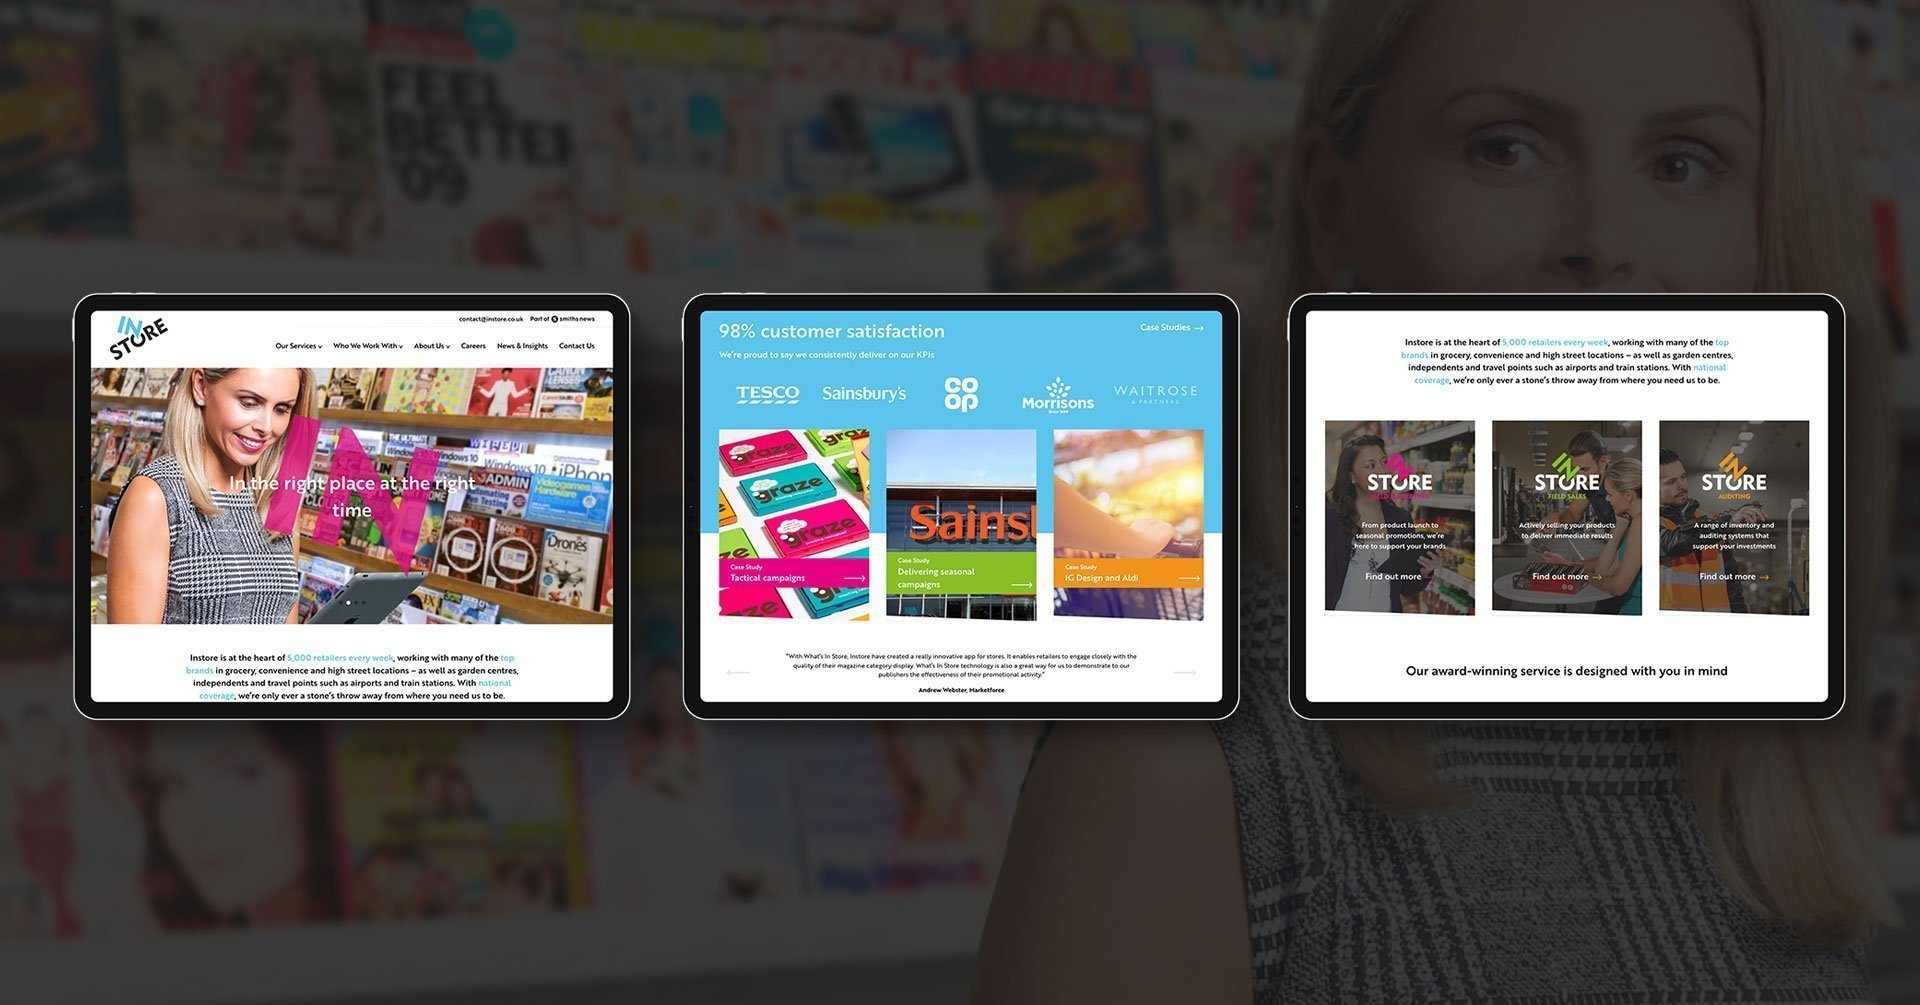 Instore website design